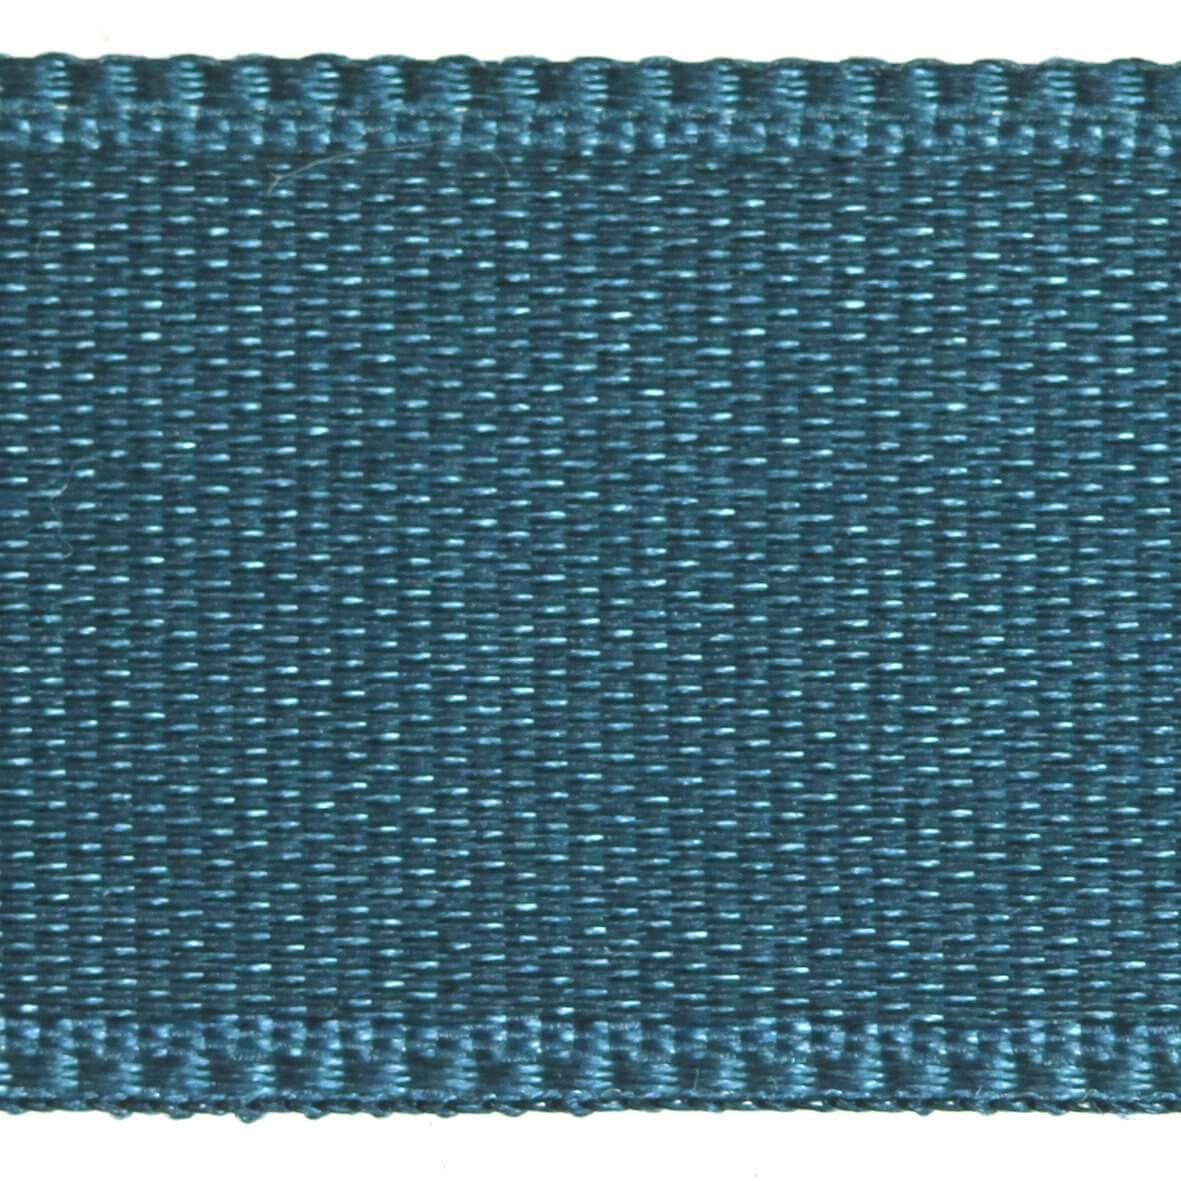 Neptune Col. 508 - 25mm Satab Ribbon